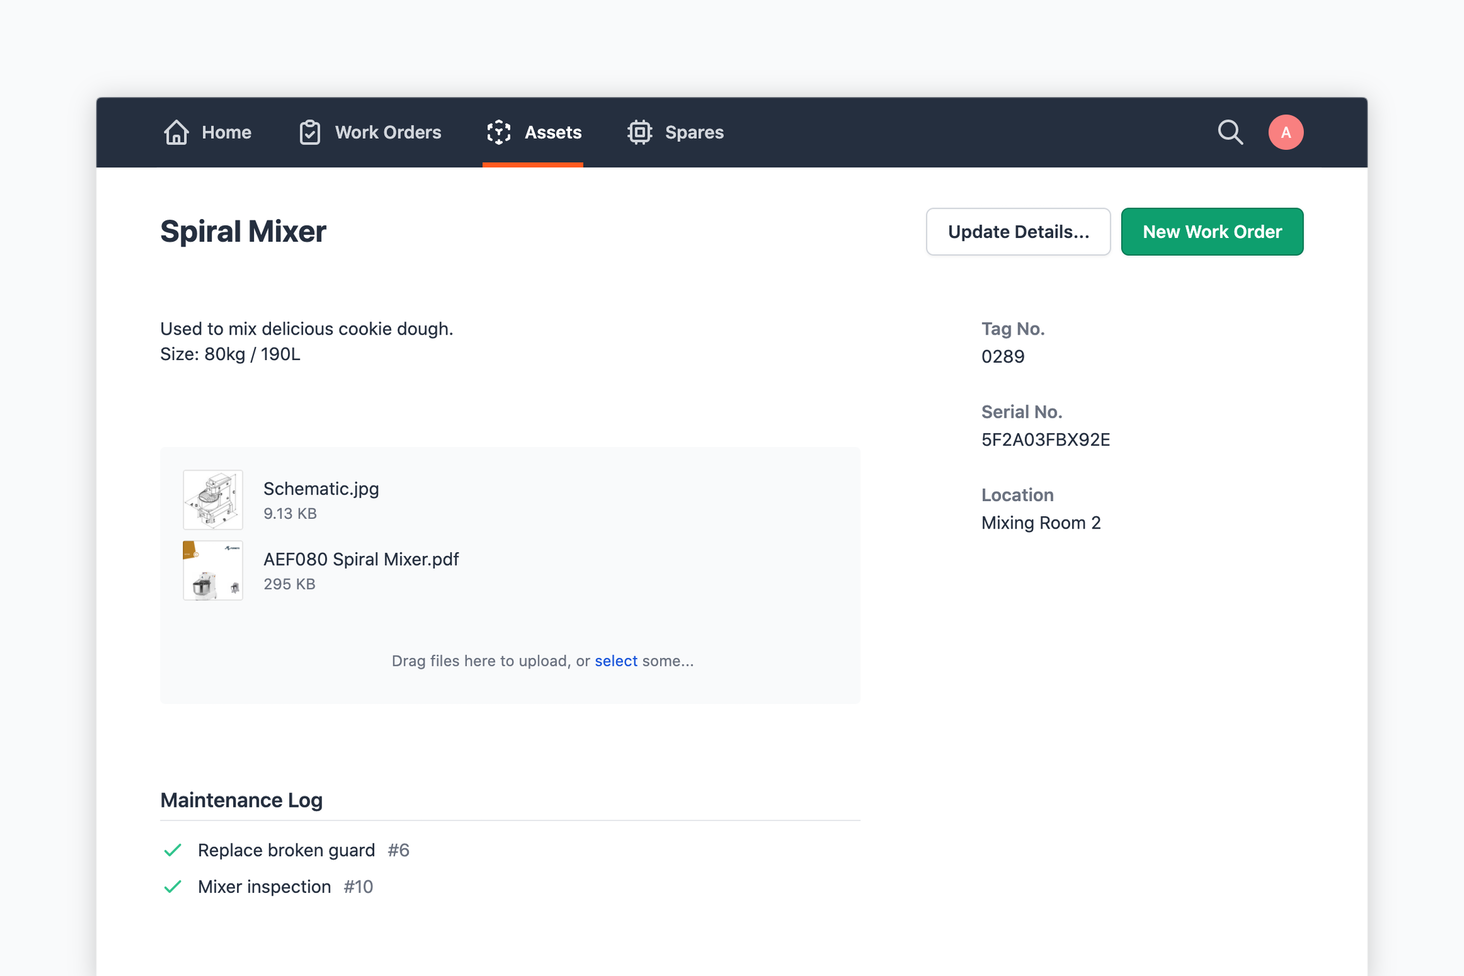 Design v3 (work order screen)